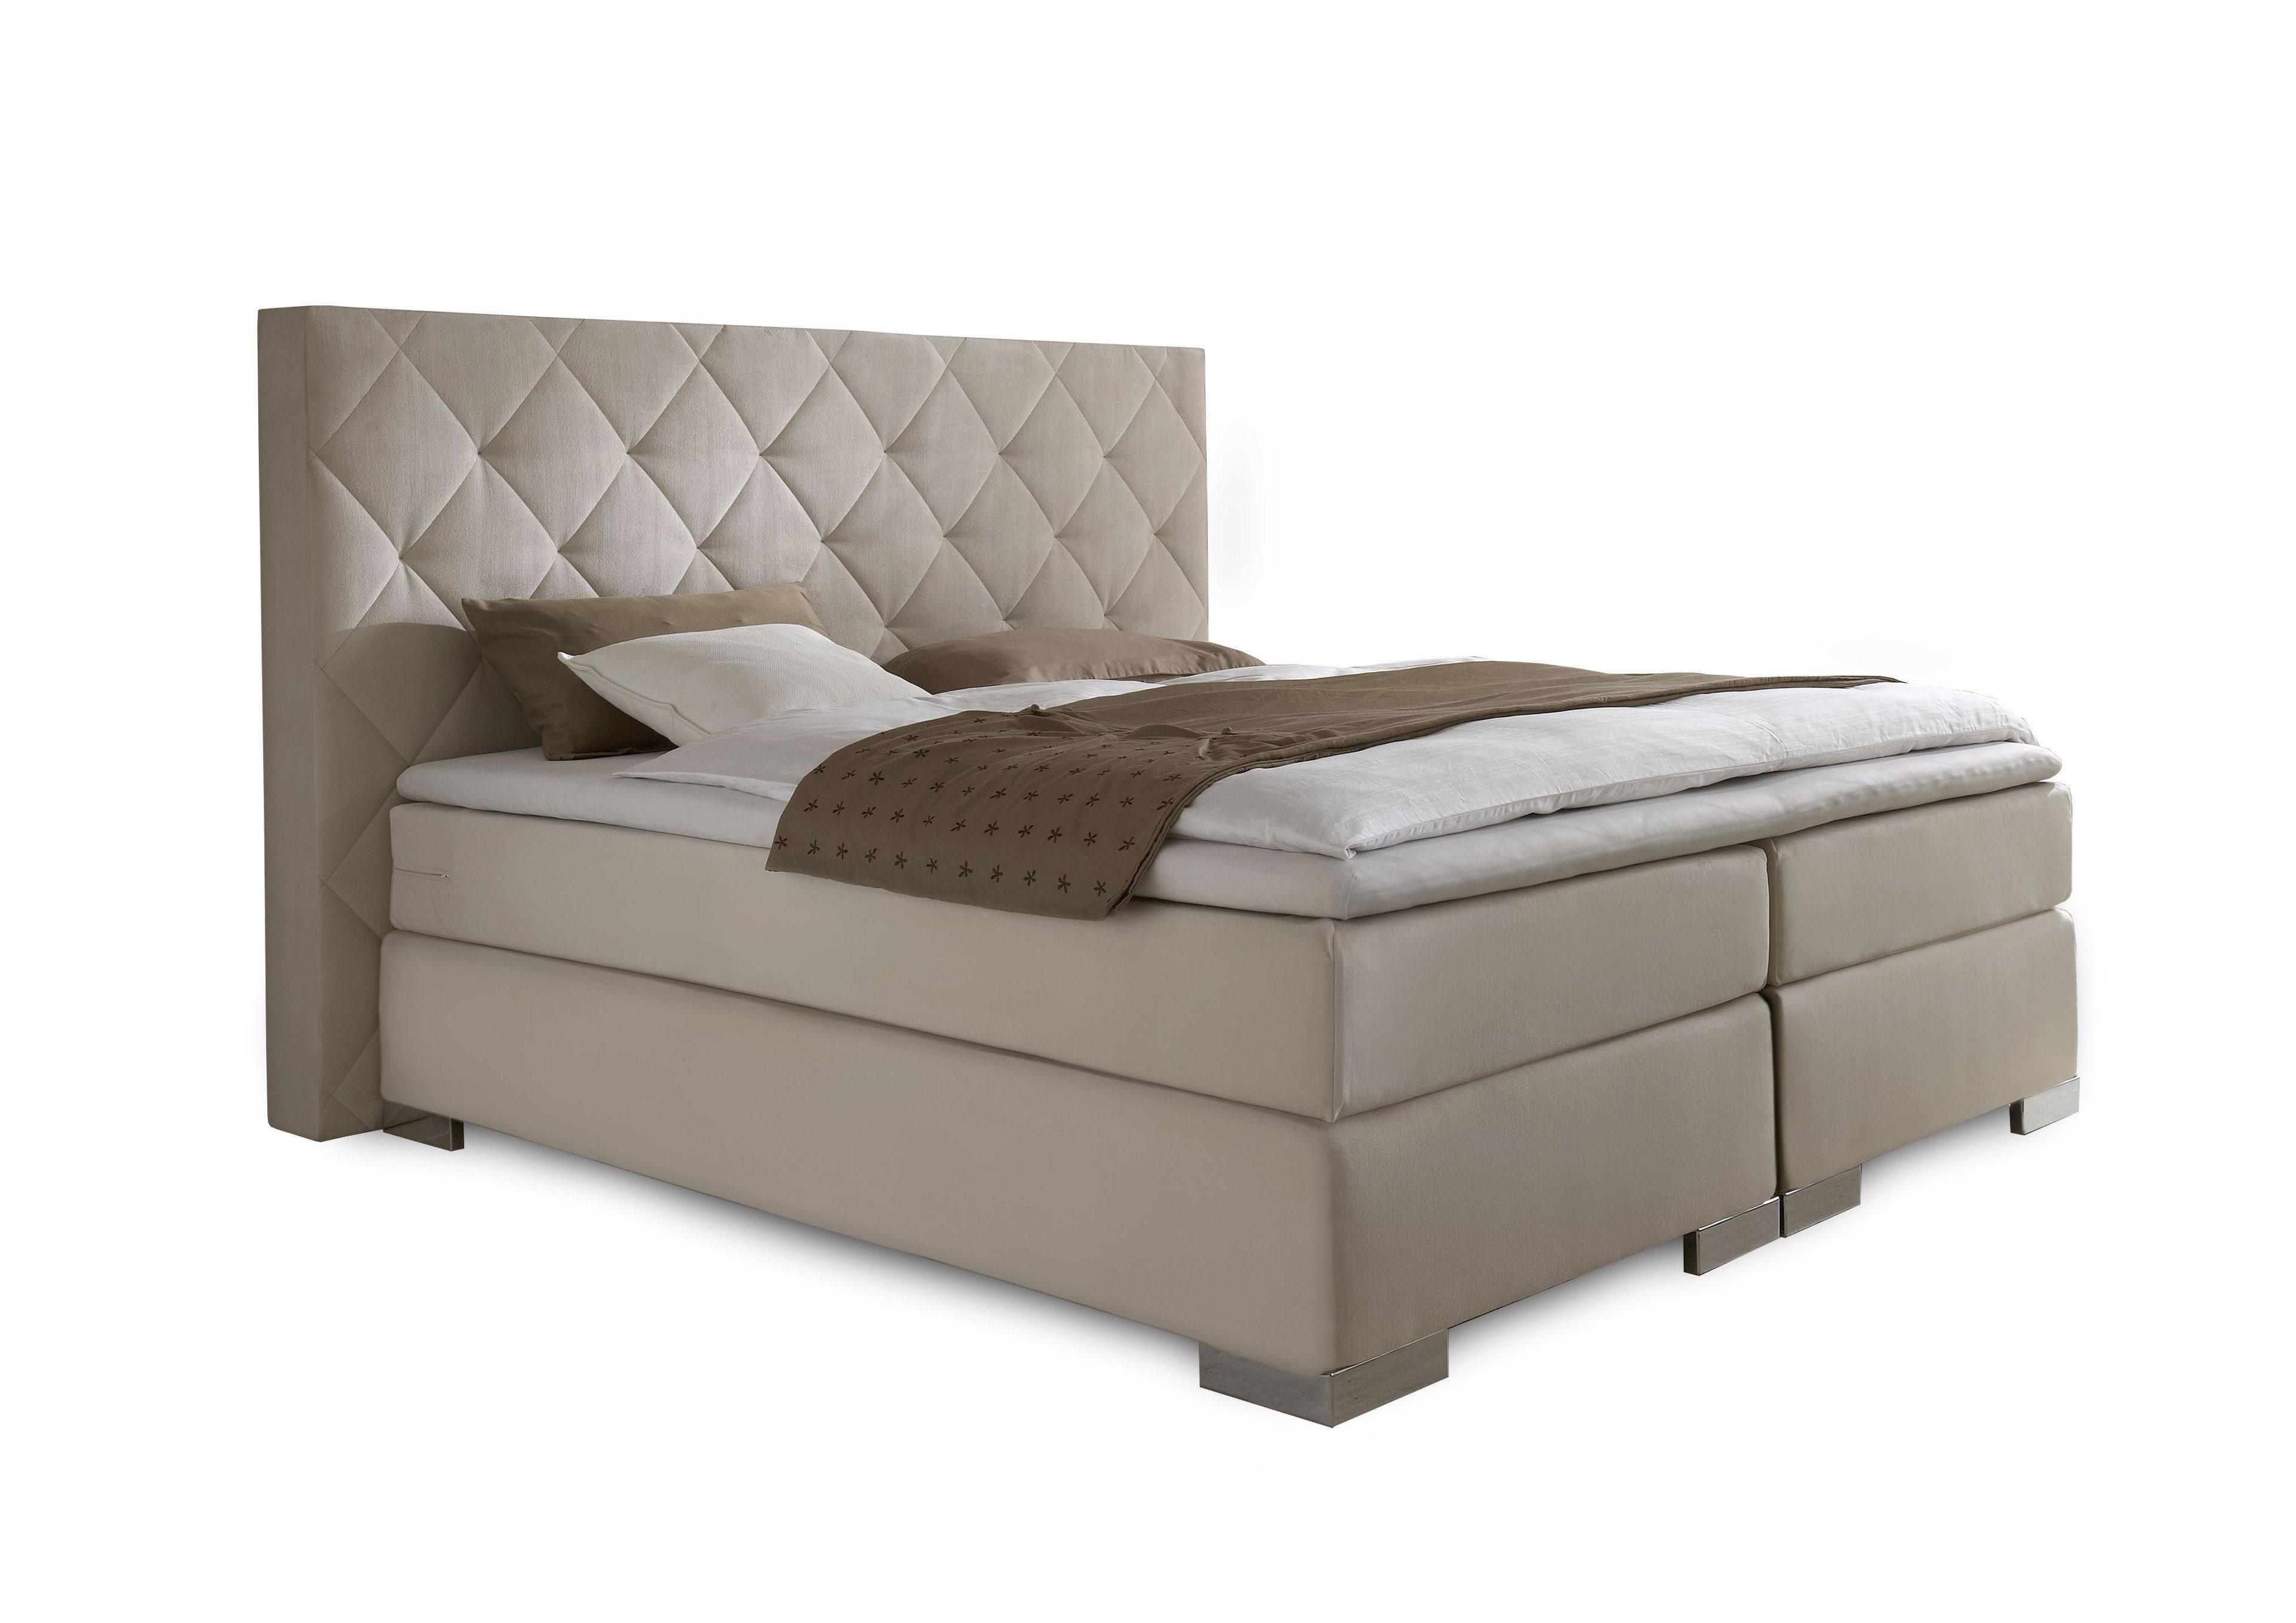 dico m bel bs9050 boxspringbett in creme m bel letz. Black Bedroom Furniture Sets. Home Design Ideas